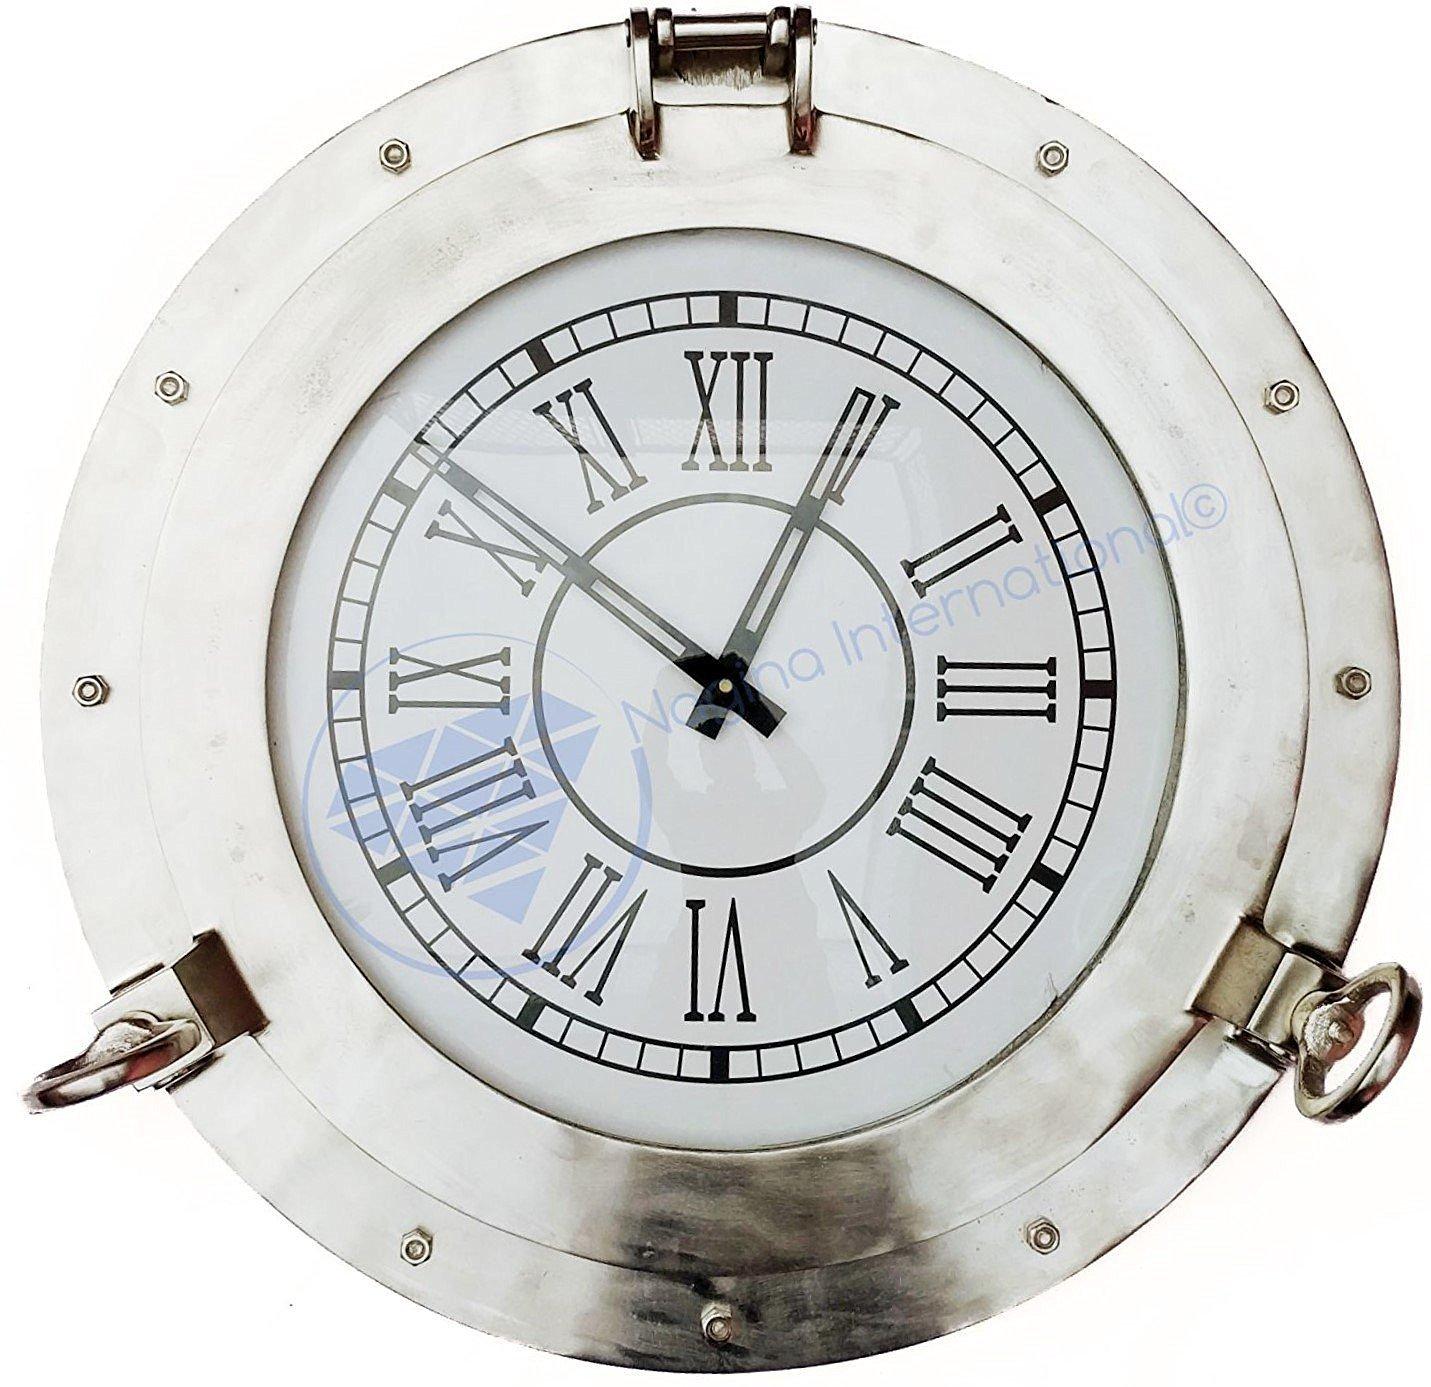 Large Aluminum Nickel Plated Wall Clock   Porthole Pirate's Gifts   Nagina International (20 Inches)